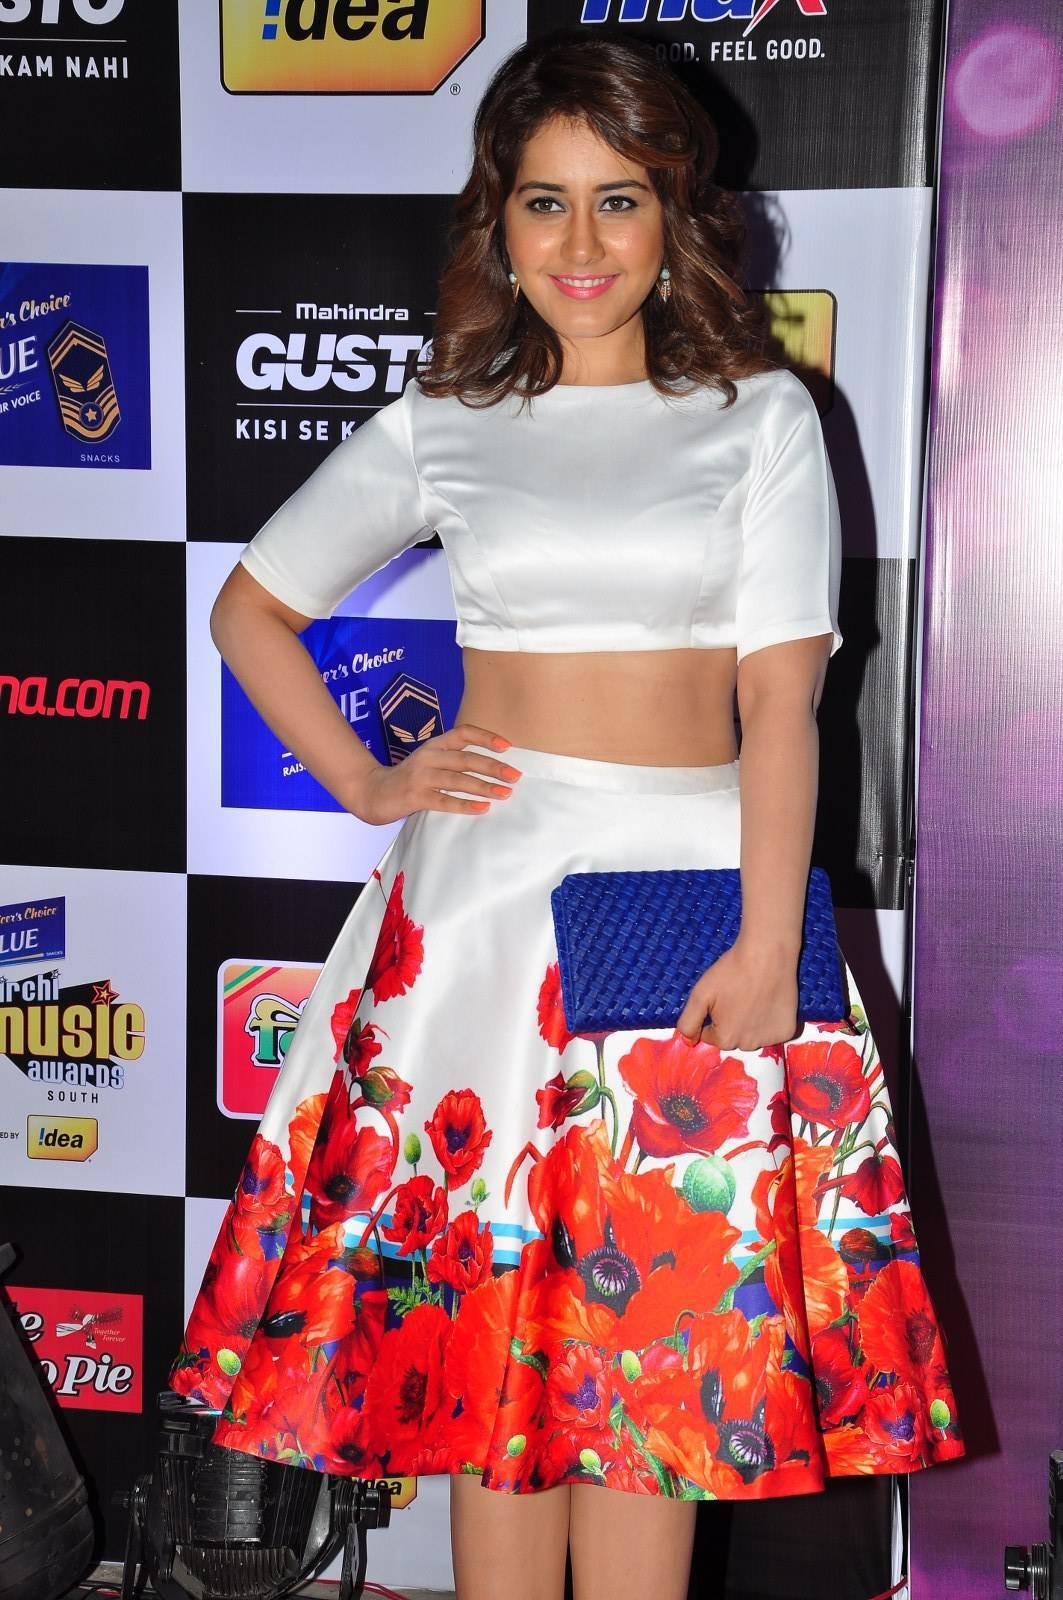 South Indian Actress Rashi Khanna Photos at Music Awards In White Dress